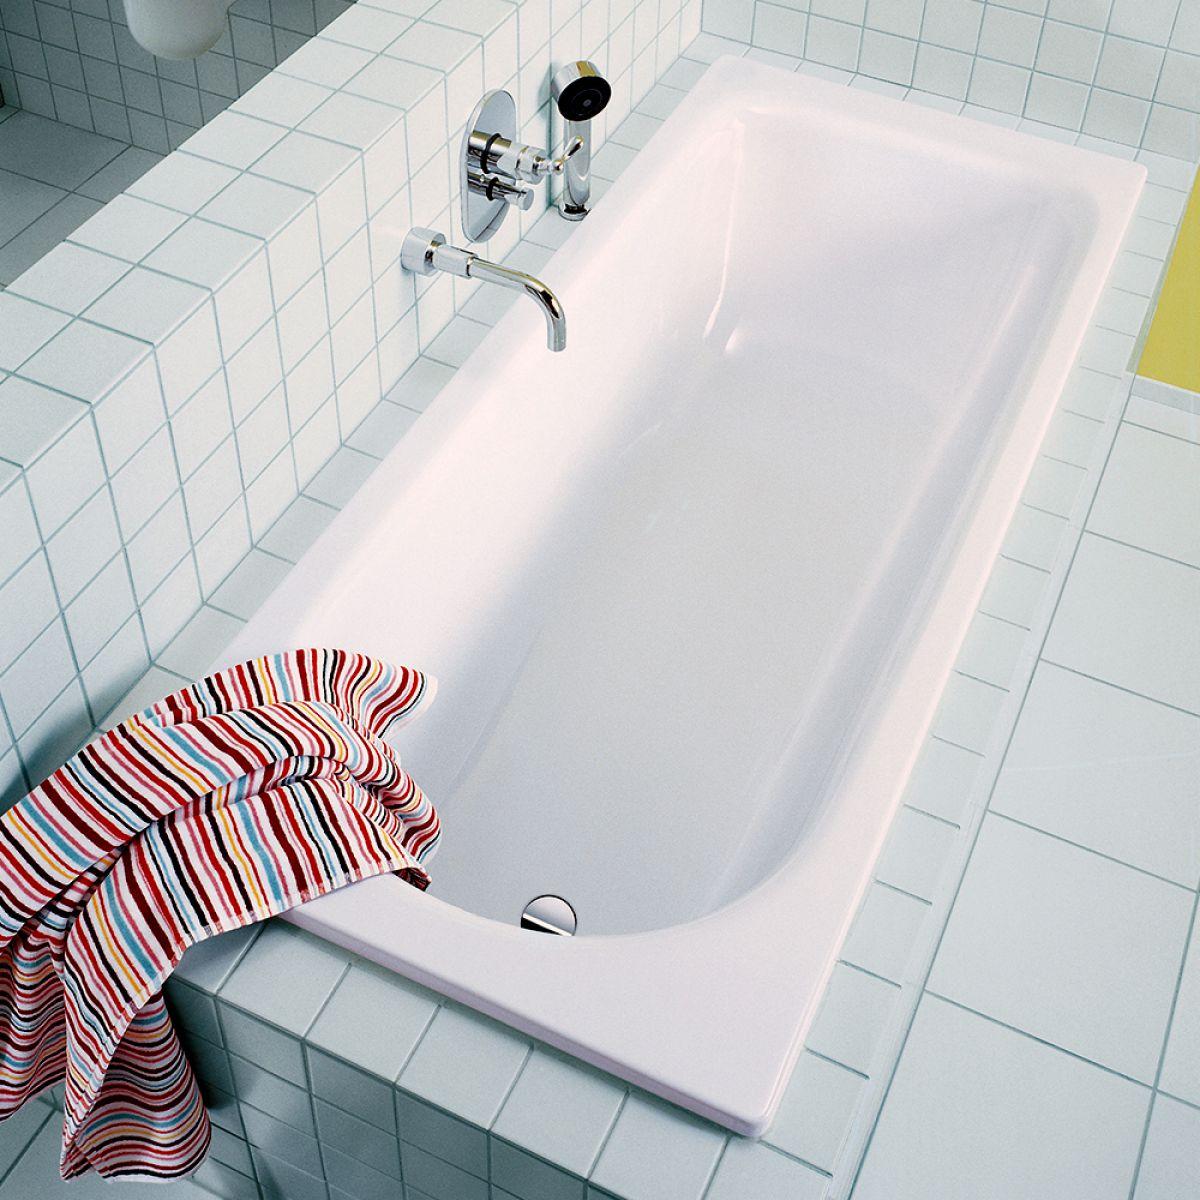 kaldewei saniform plus eco steel bath uk bathrooms. Black Bedroom Furniture Sets. Home Design Ideas